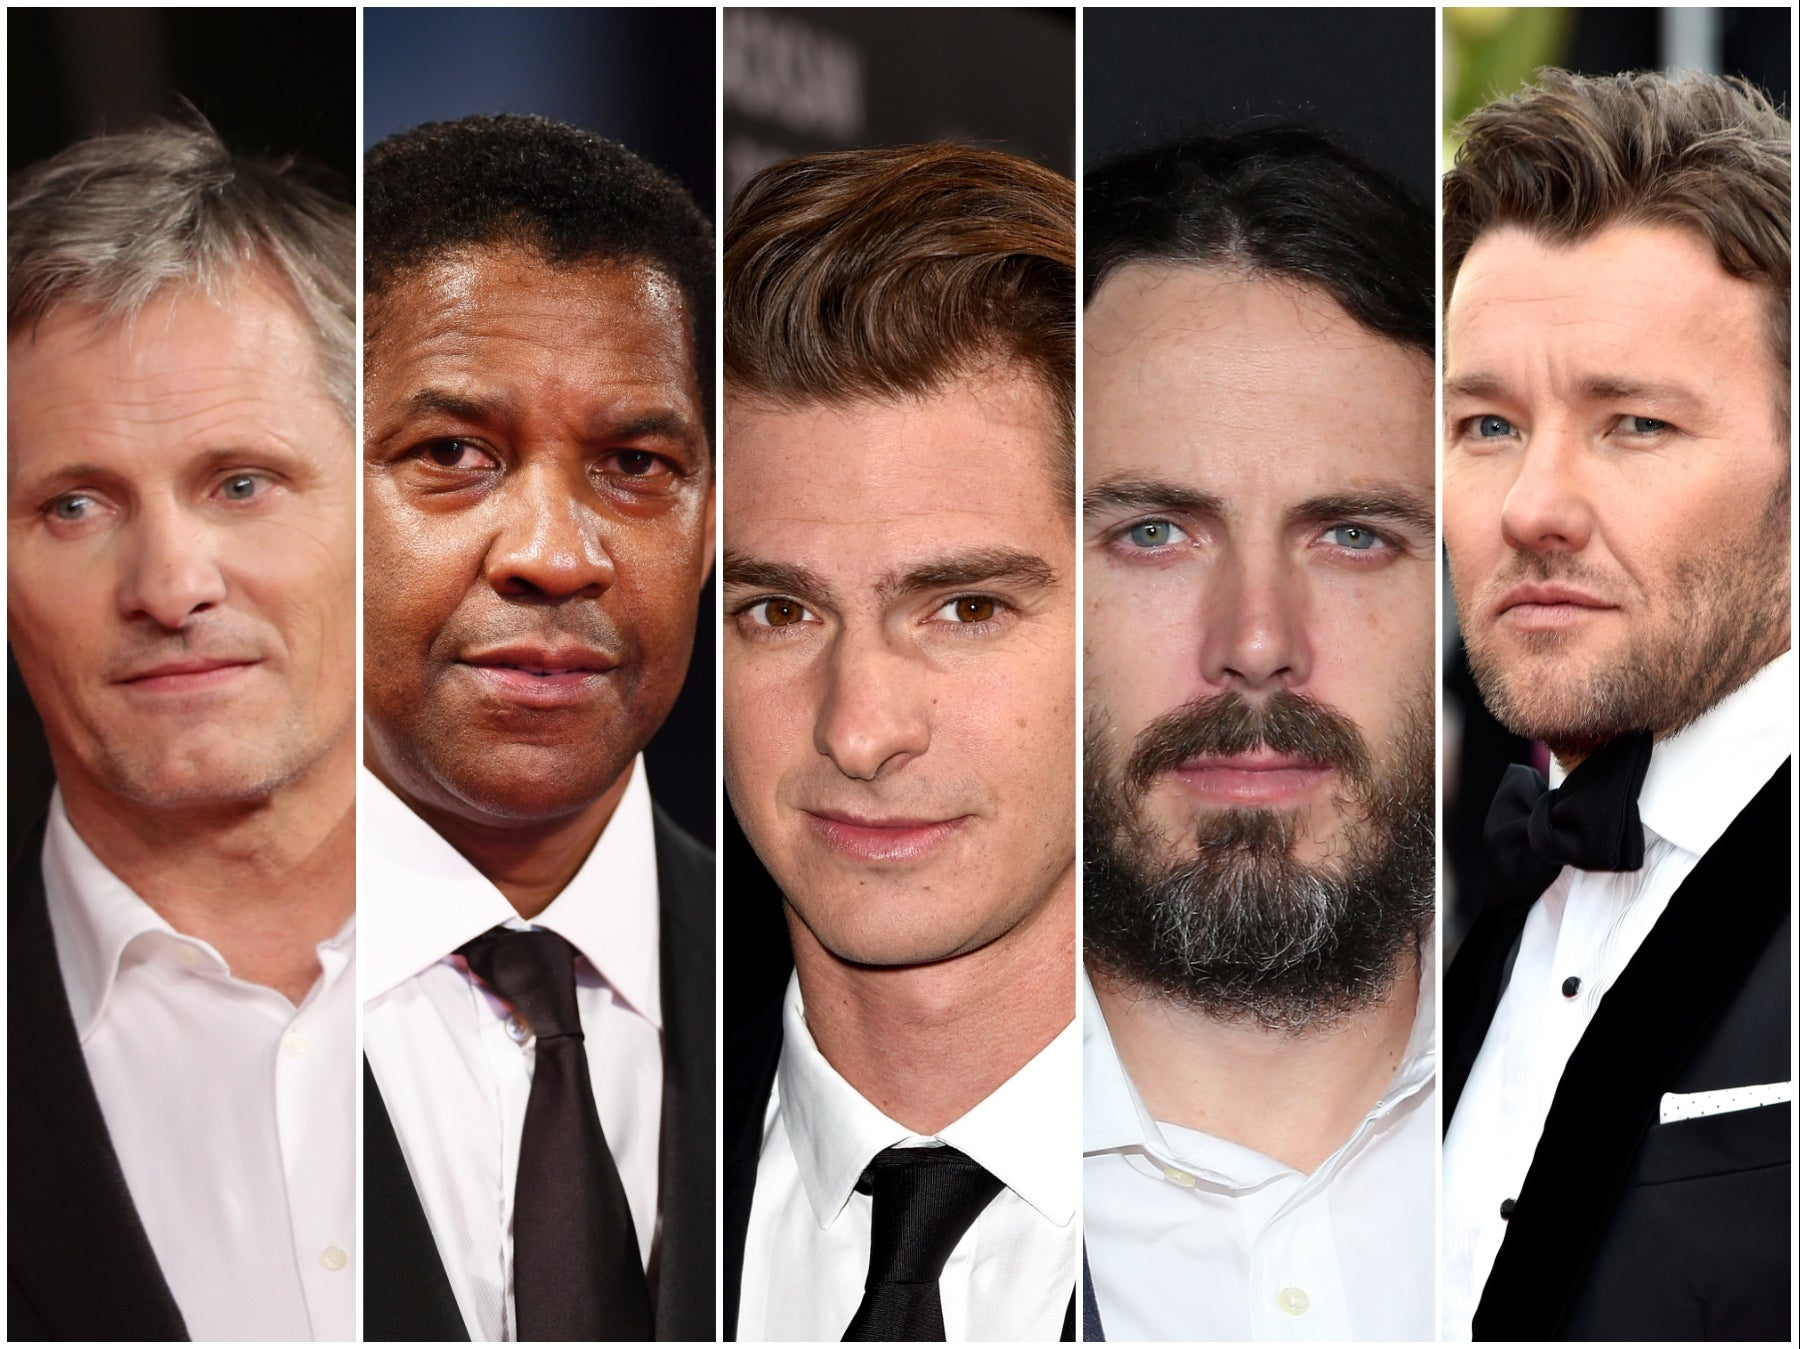 Golden globes best foreign film nominees